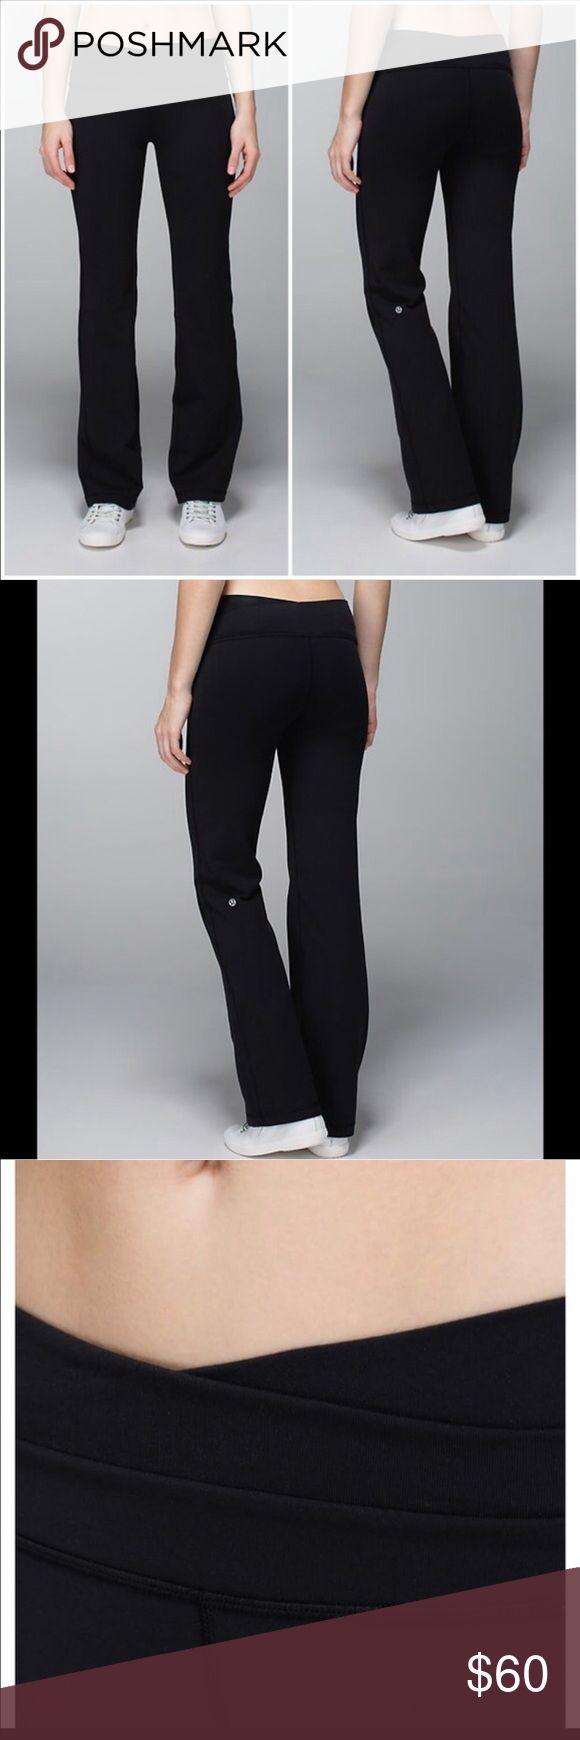 Lulu Lemon black astro pant NWOT New without tags. Never been worn. Length: regular. 81% nylon and 19% lycra spandex lululemon athletica Pants